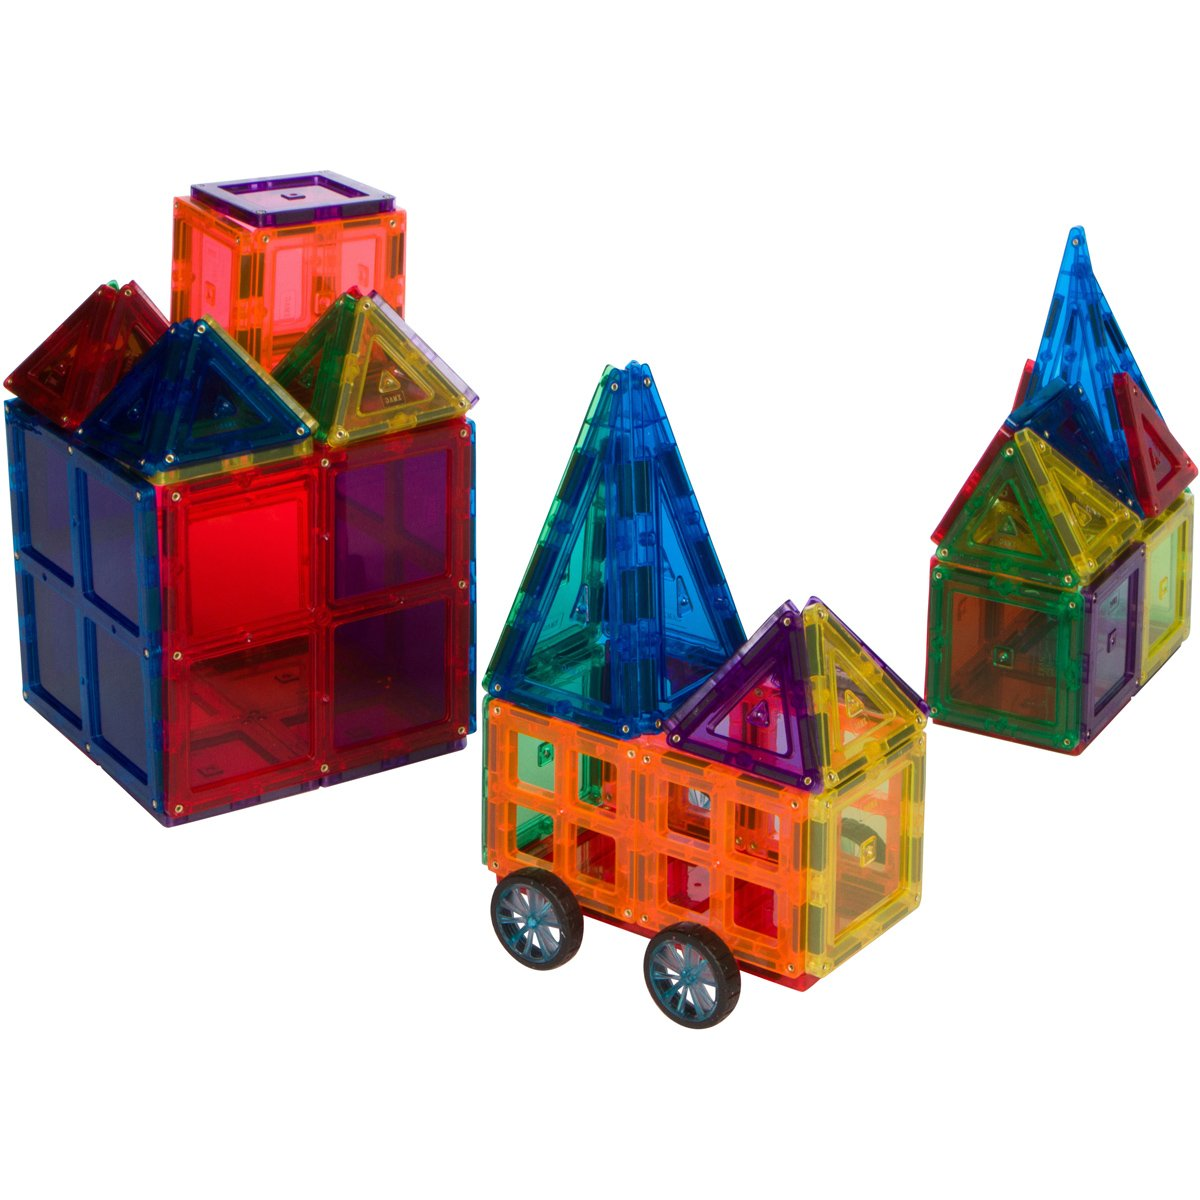 35pcs Magnetic Blocks For Kids Building Blocks Set Includes a Car Base and Windows Meets ASTM F963 Standards